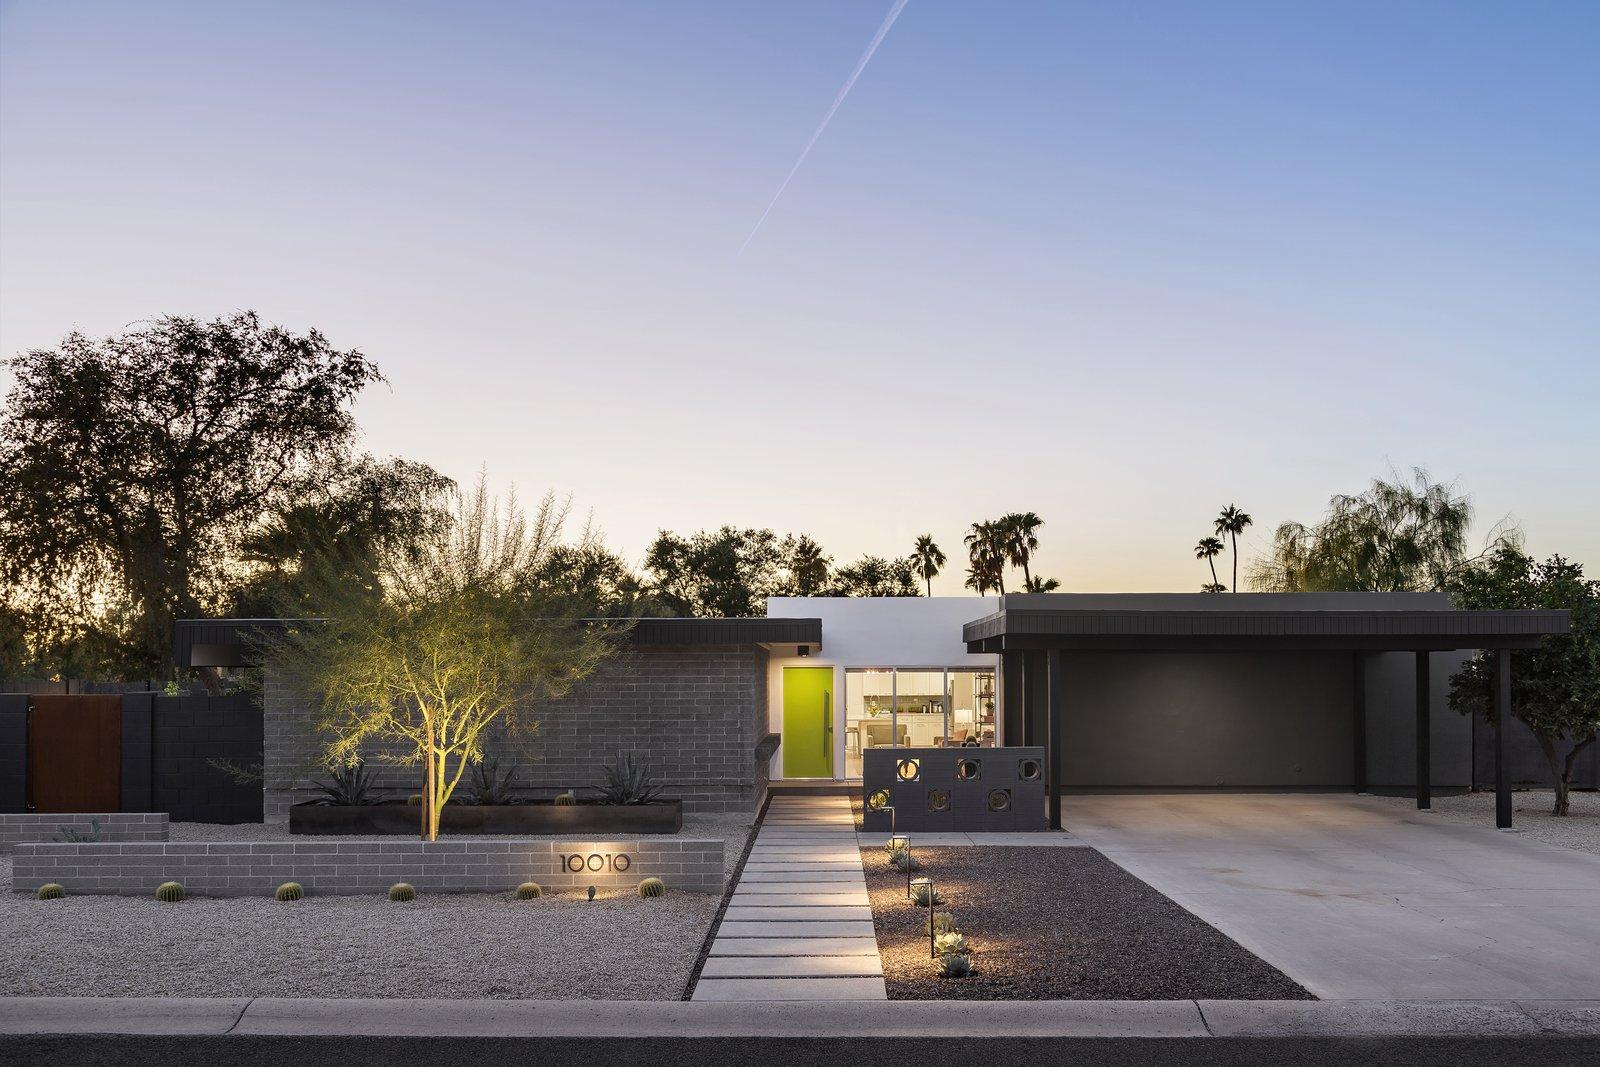 Outdoor, Desert, Raised Planters, Pavers, Concrete, Horizontal, Concrete, and Landscape Desert Midcentury Modern Landscape  Best Outdoor Horizontal Pavers Photos from Beadle Buddy